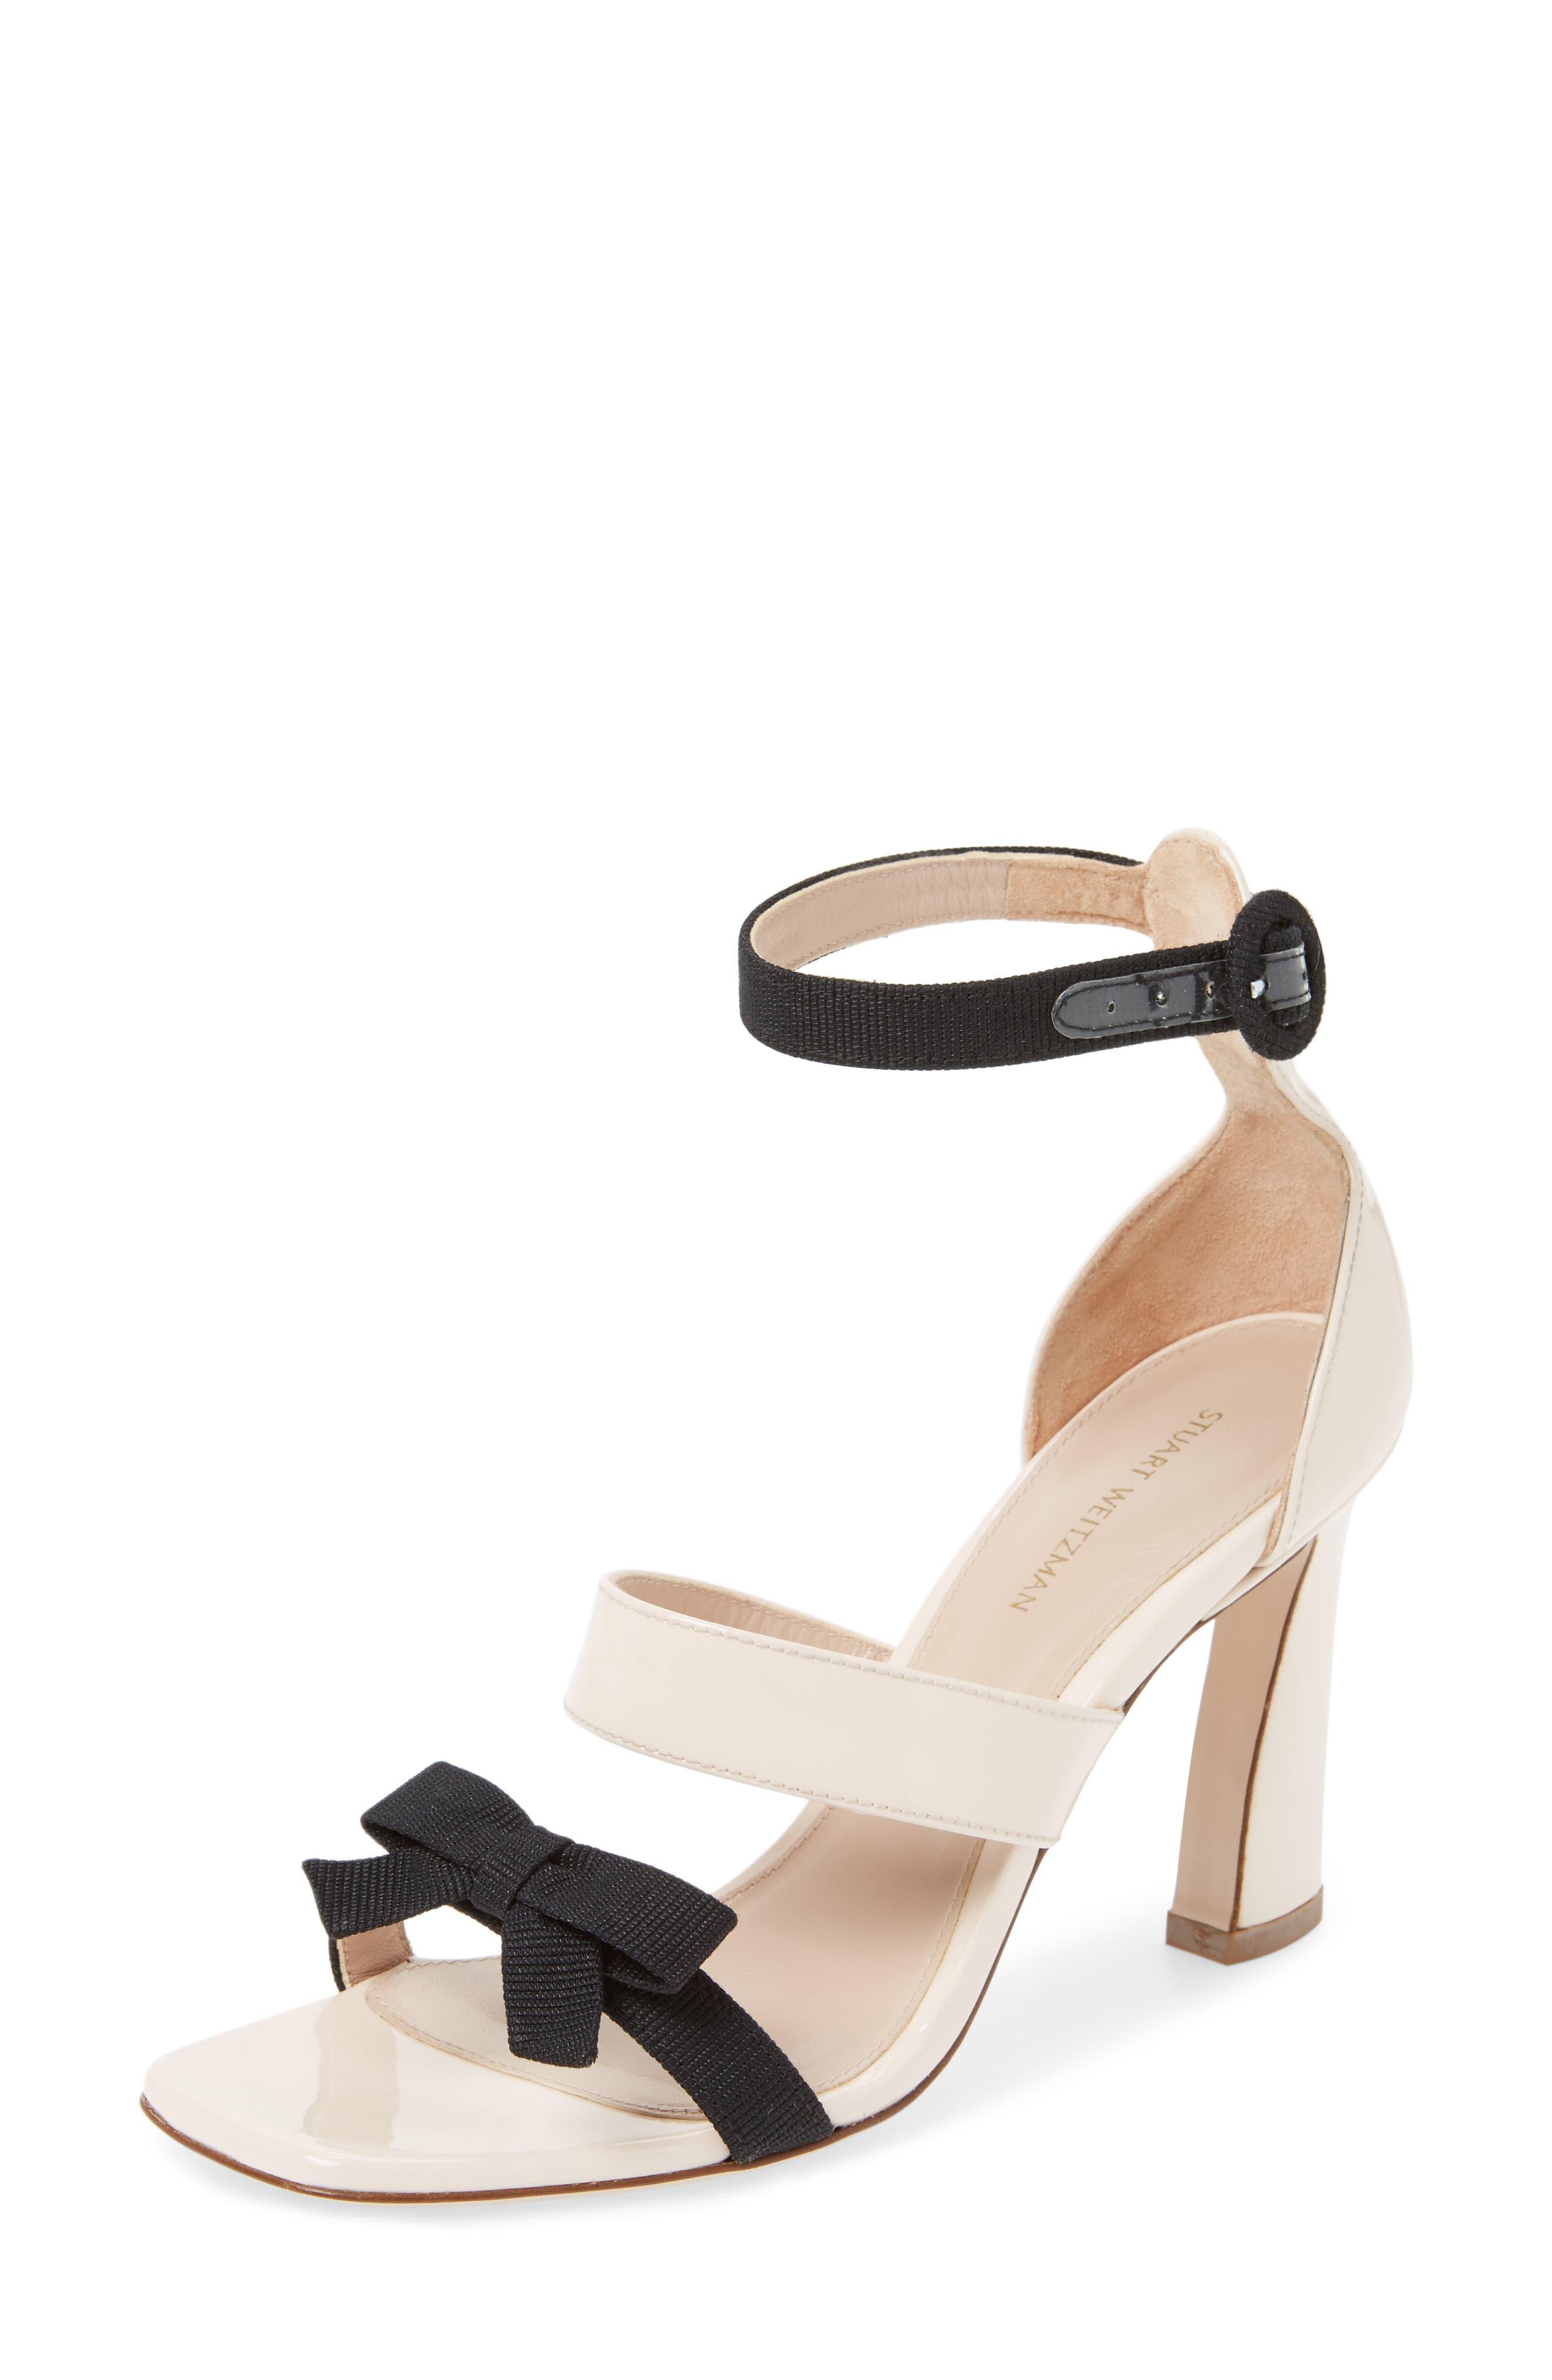 Main Image - Stuart Weitzman Ally Bow Sandal (Women)